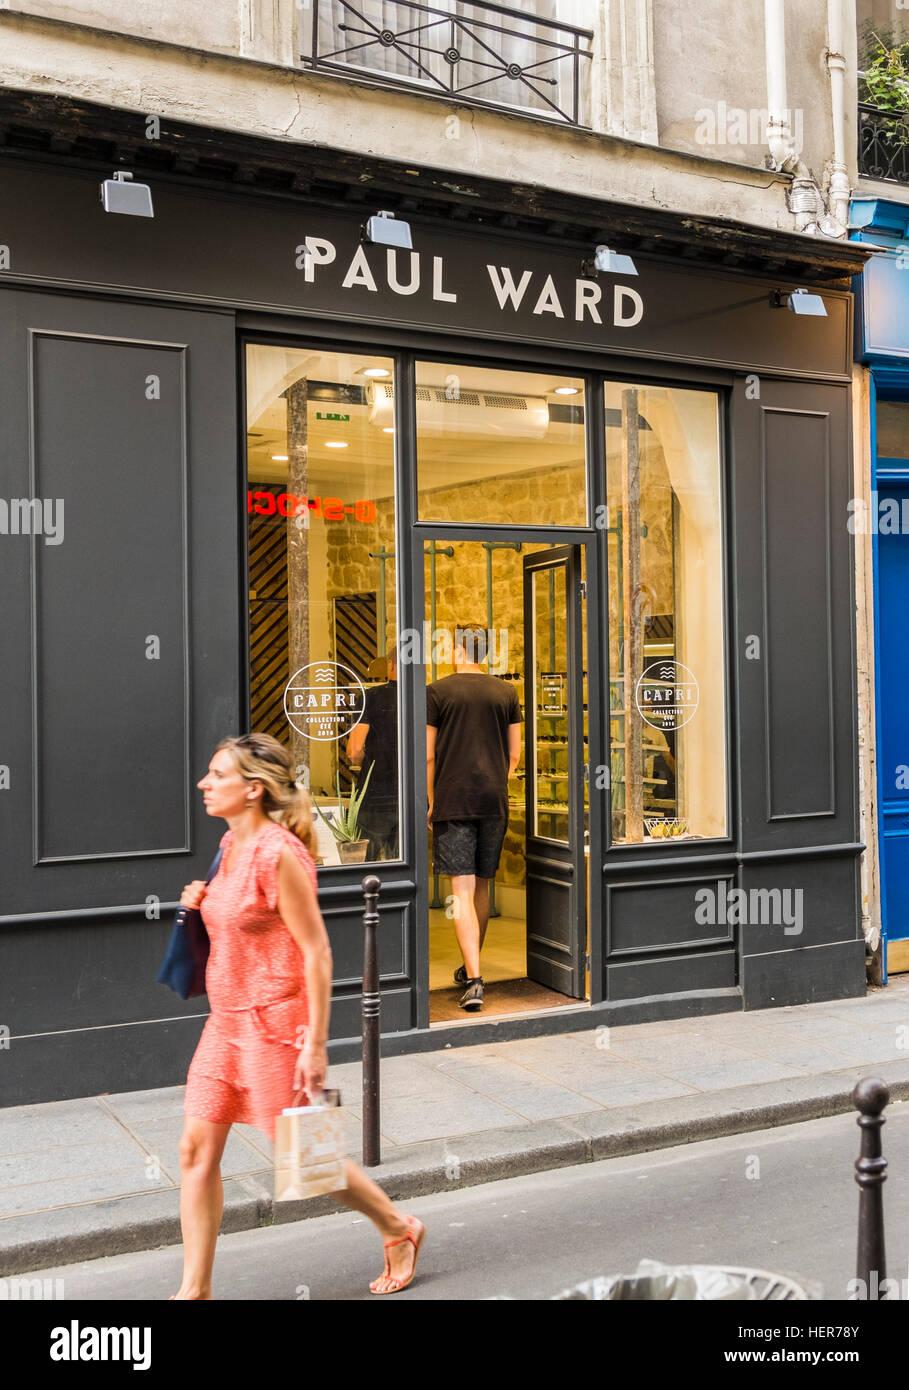 paul ward eyewear store - Stock Image